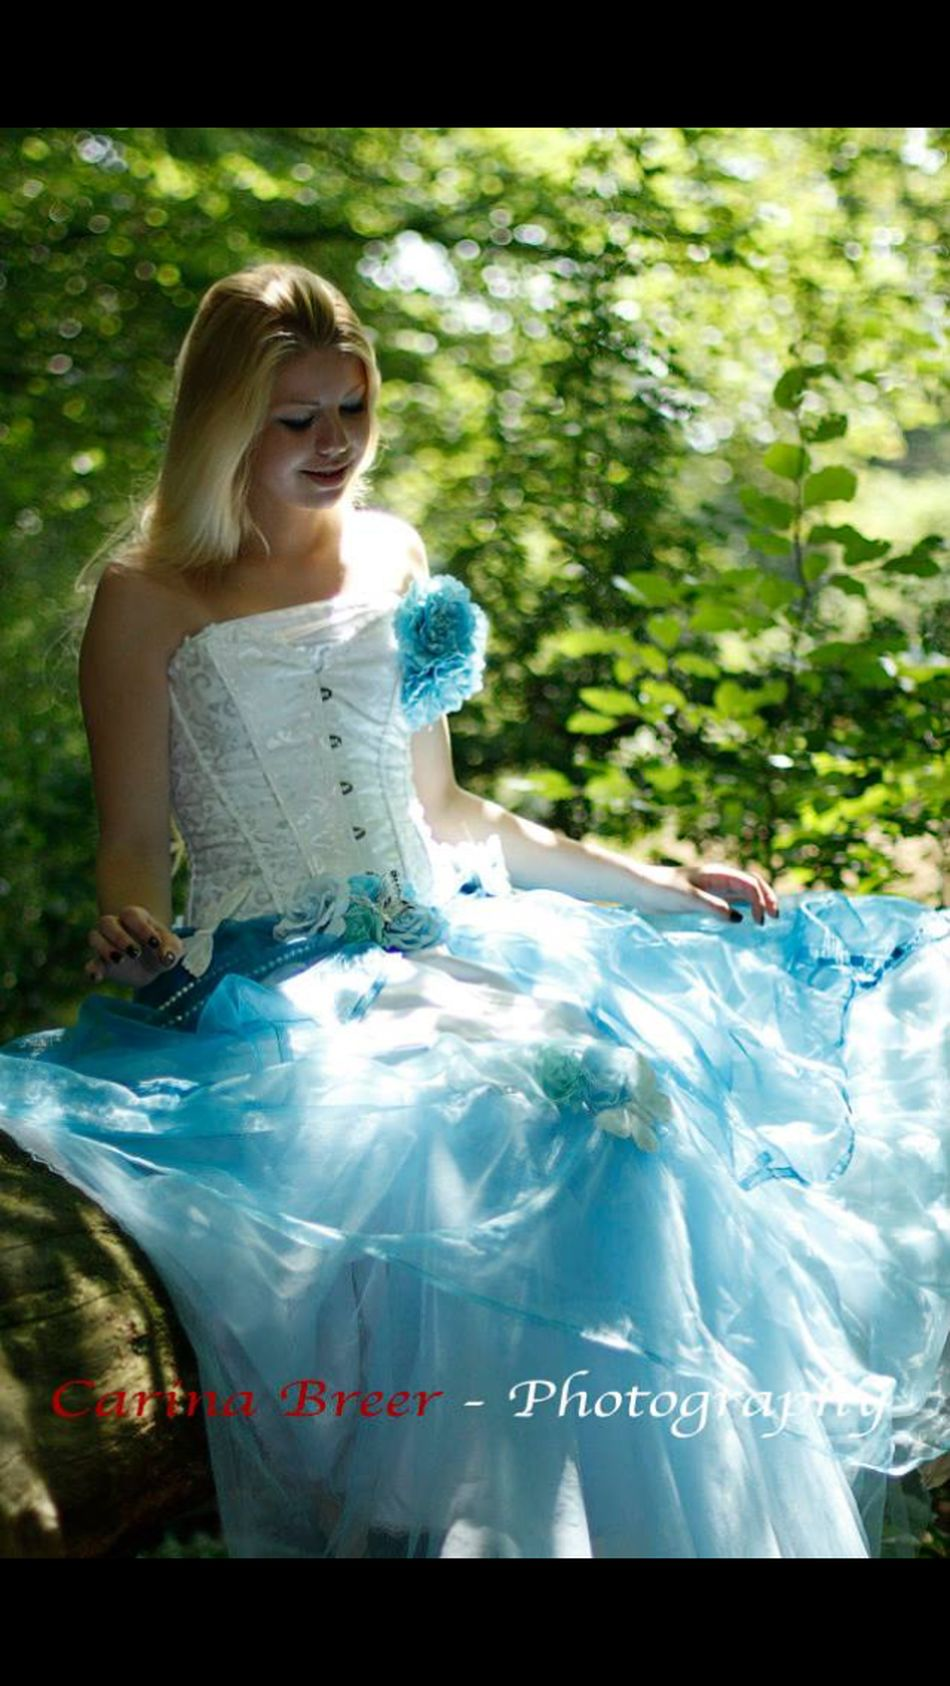 Fantasy Kleid Mittelalter Fantasy Photography Netherland FeenWorld Kleider